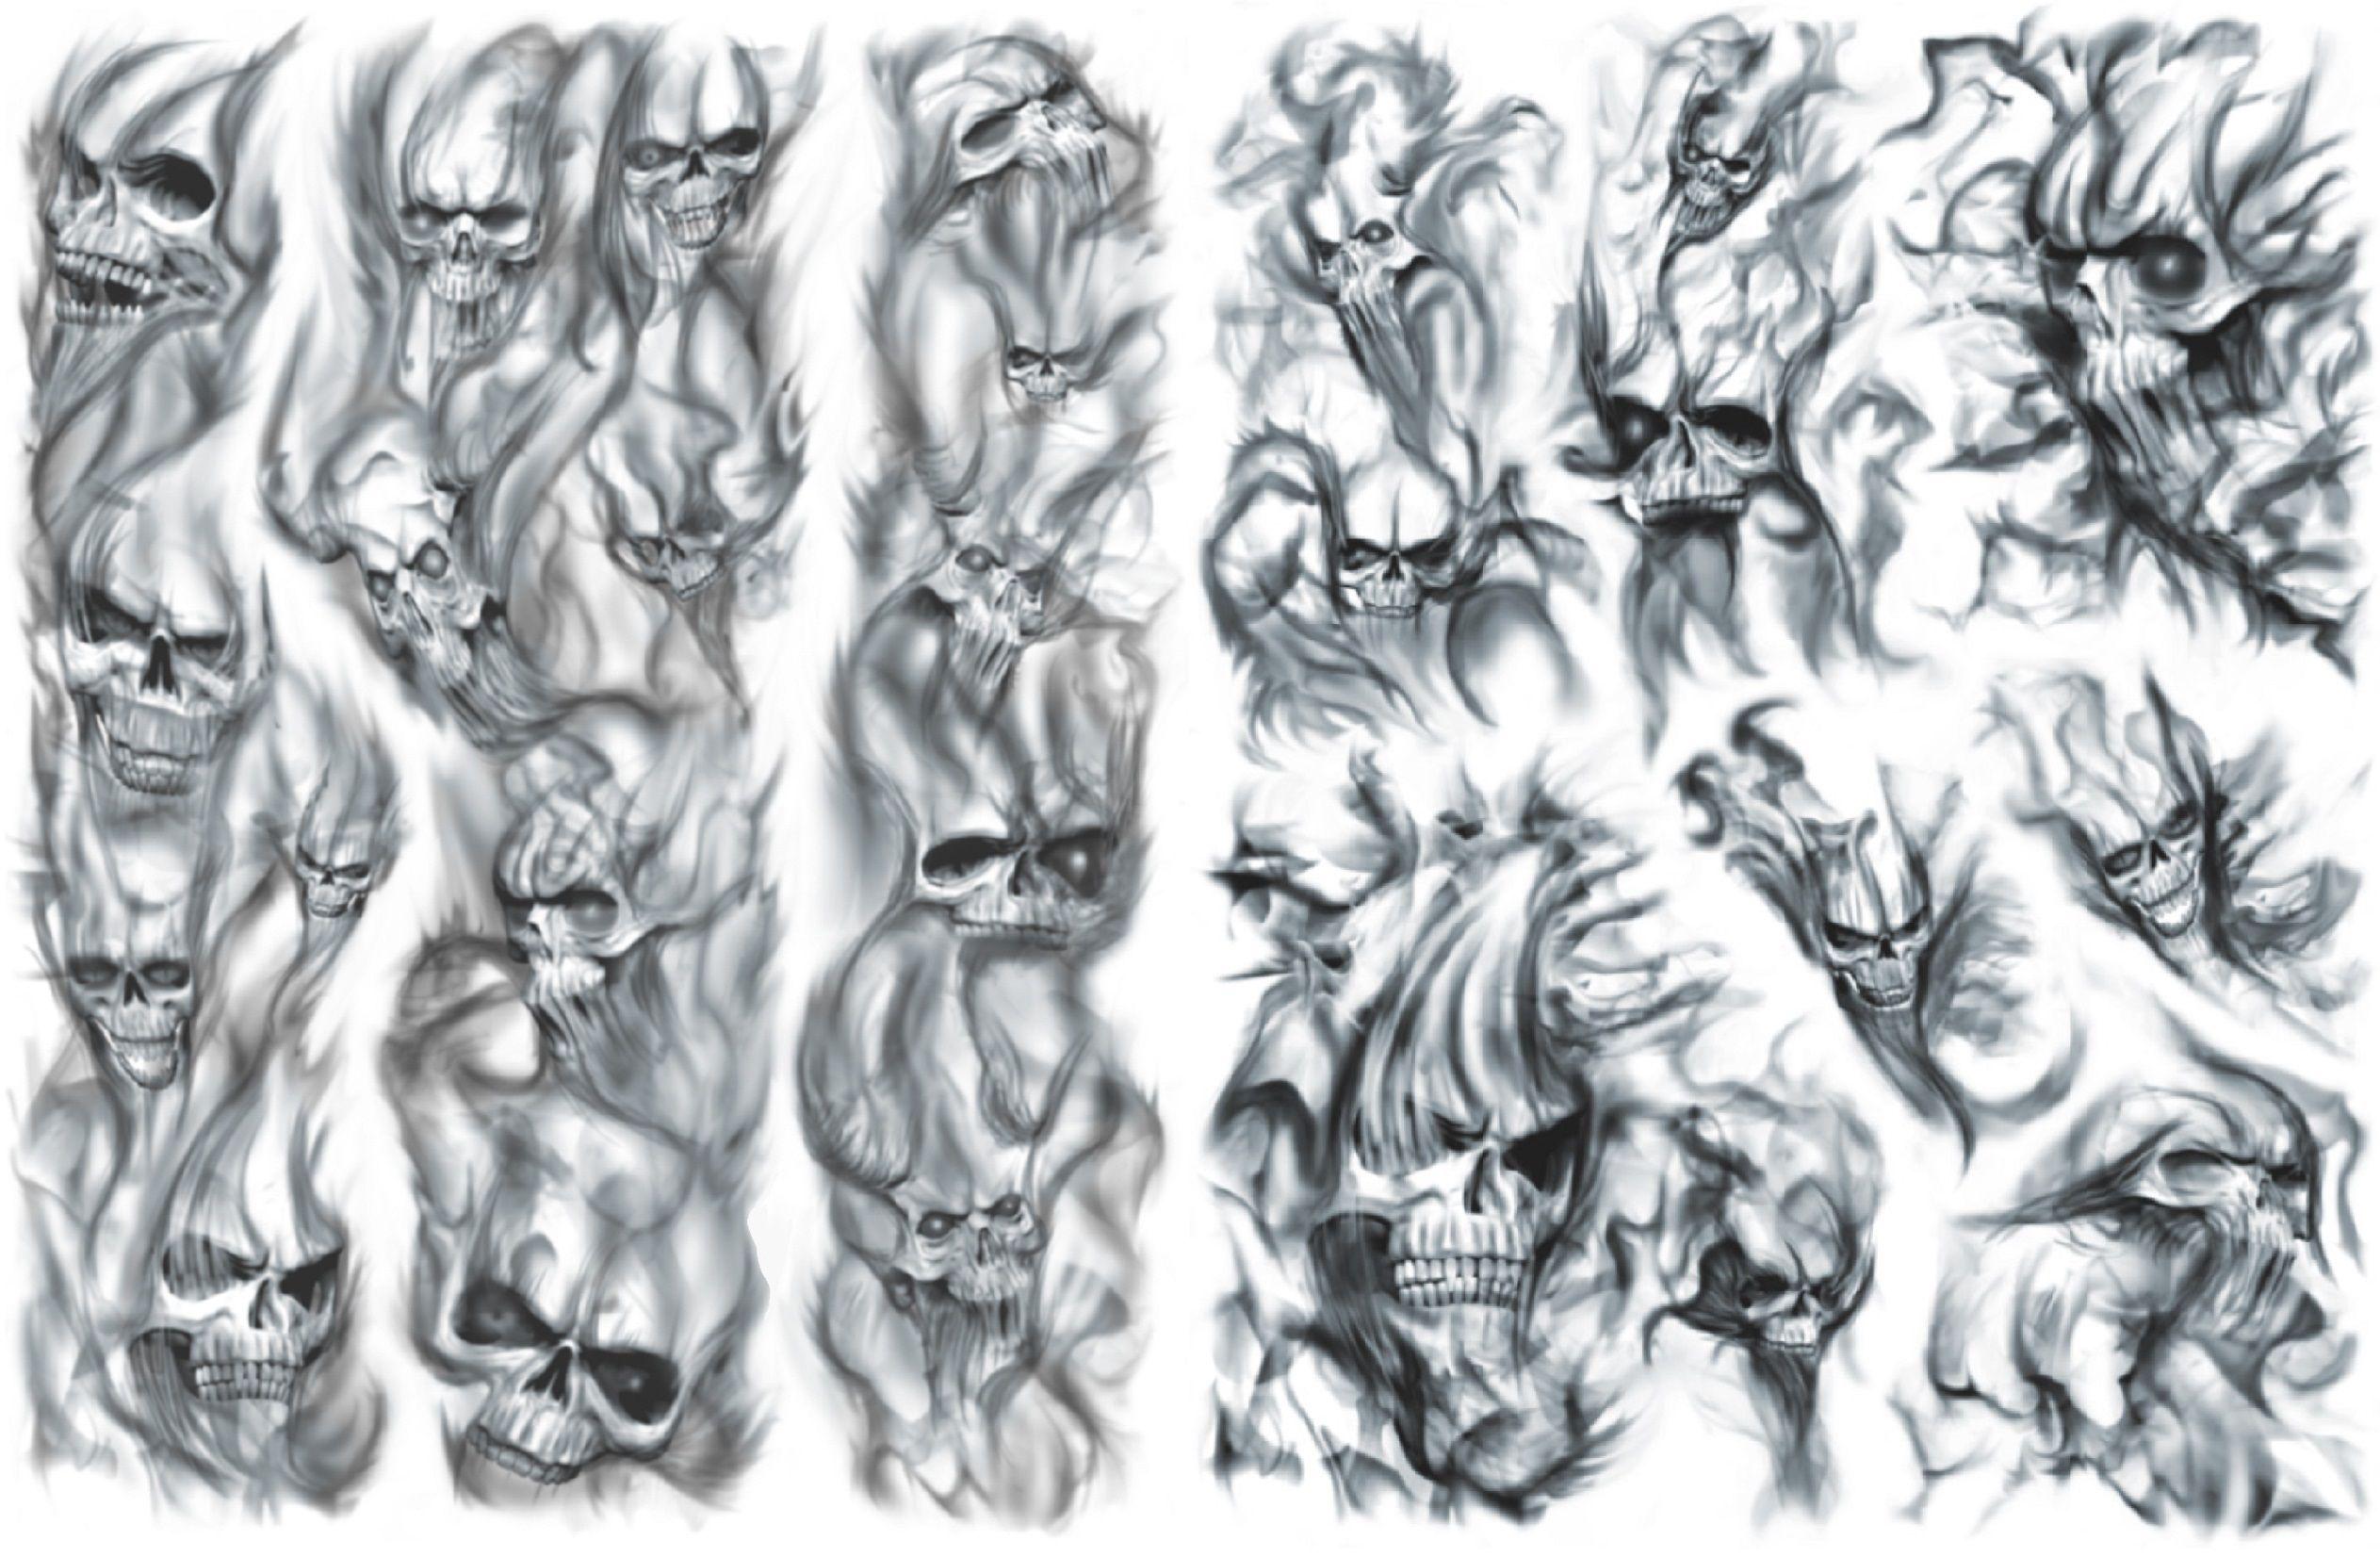 'Skulls in Smoke' Filler Tattoo Tattoos I find